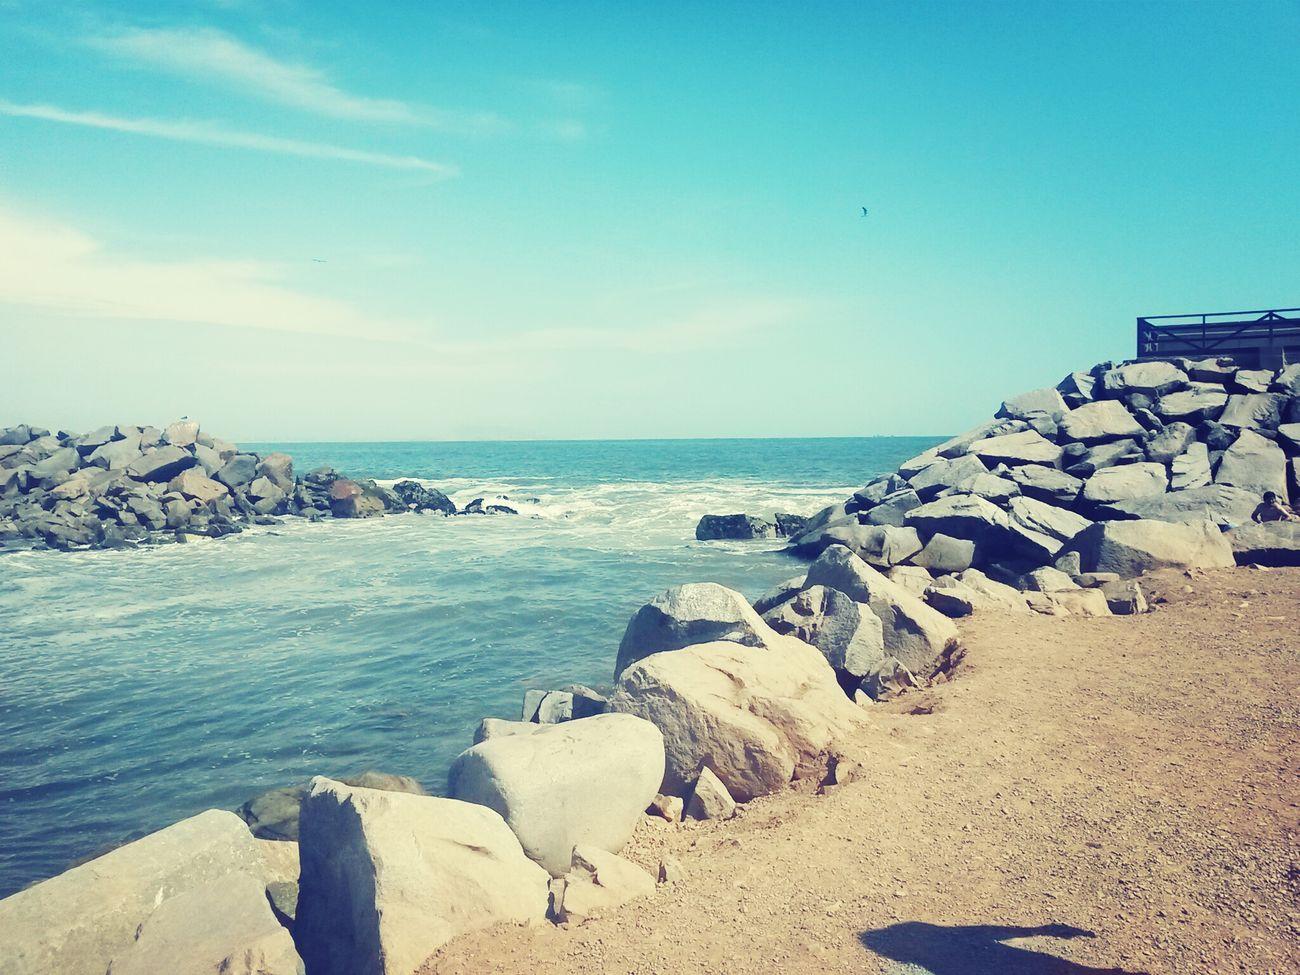 friday of beach Peru Beach Beachphotography Changeyourperspective